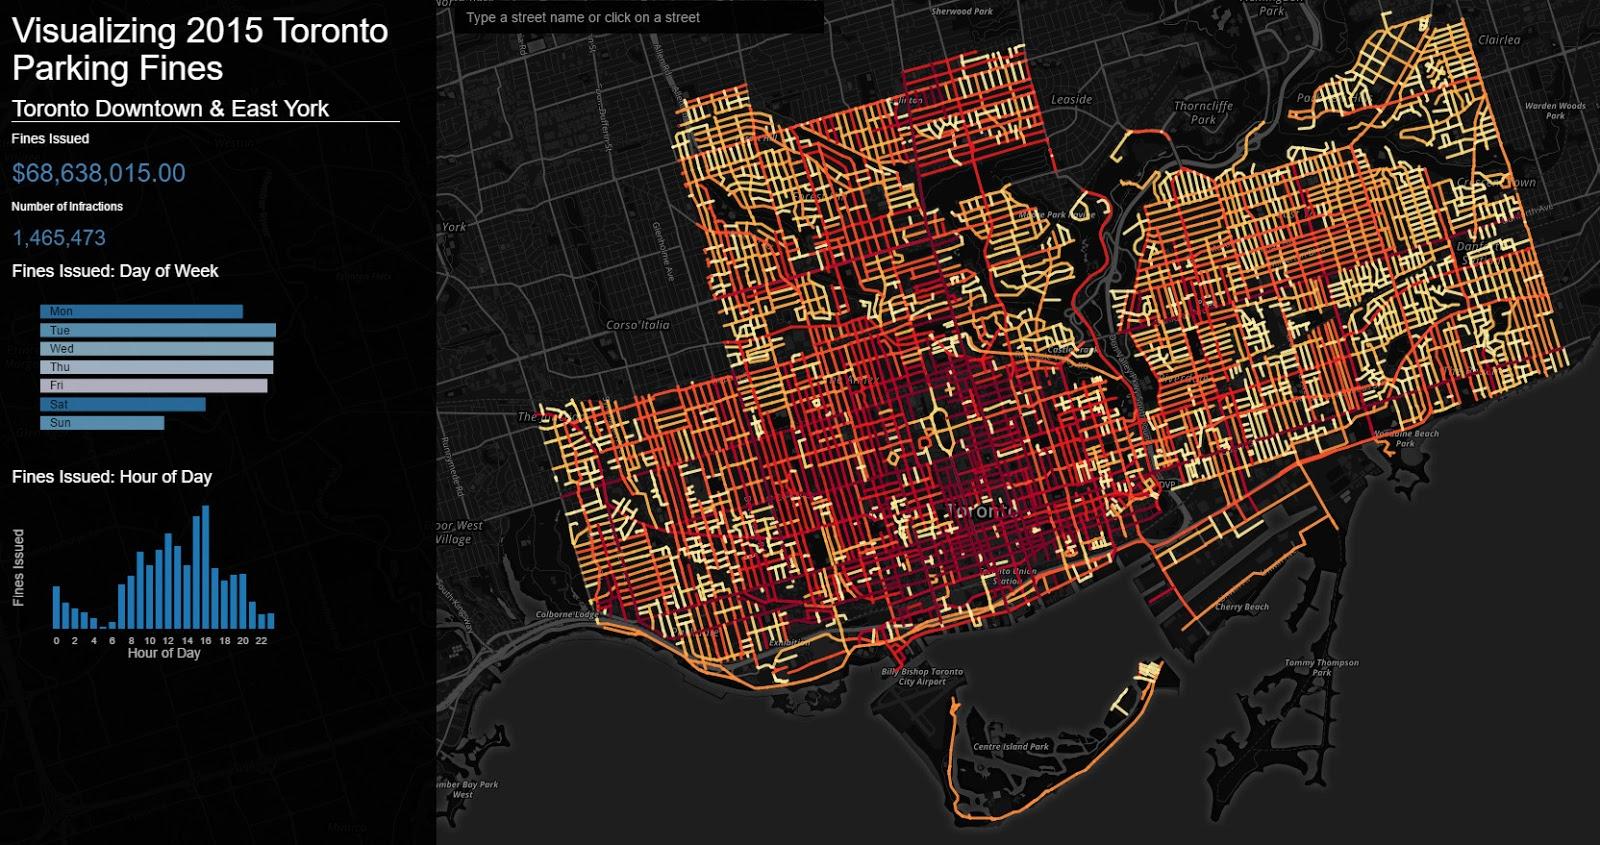 Visualizing Toronto parking fines